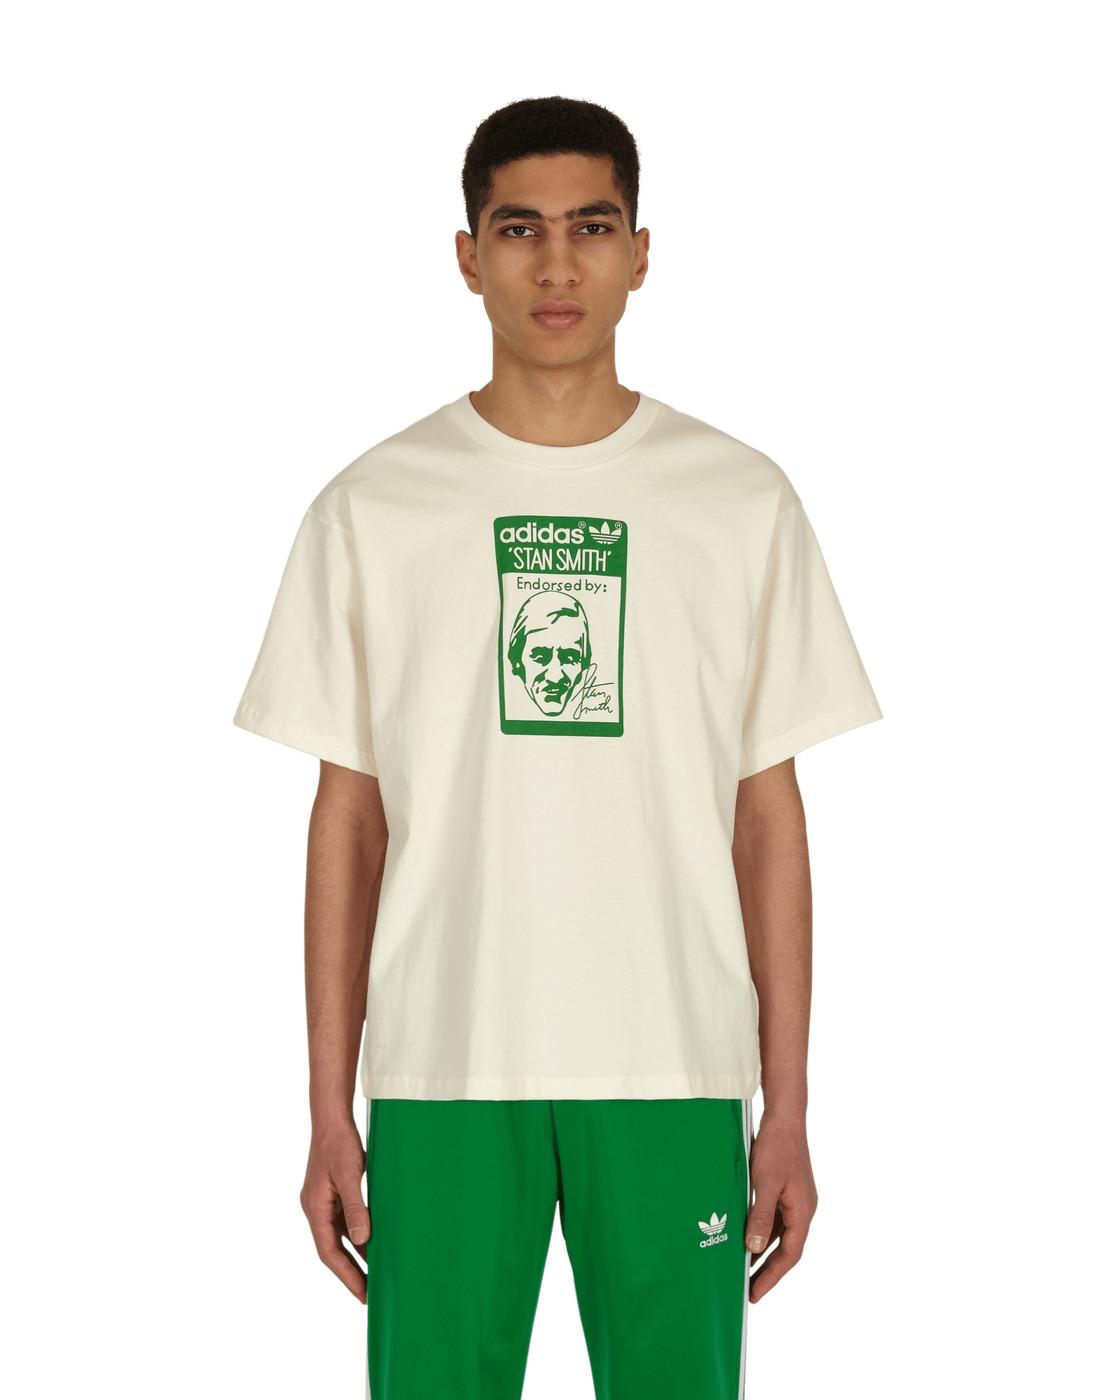 Adidas Originals Stan Smith T Shirt Non Dyed